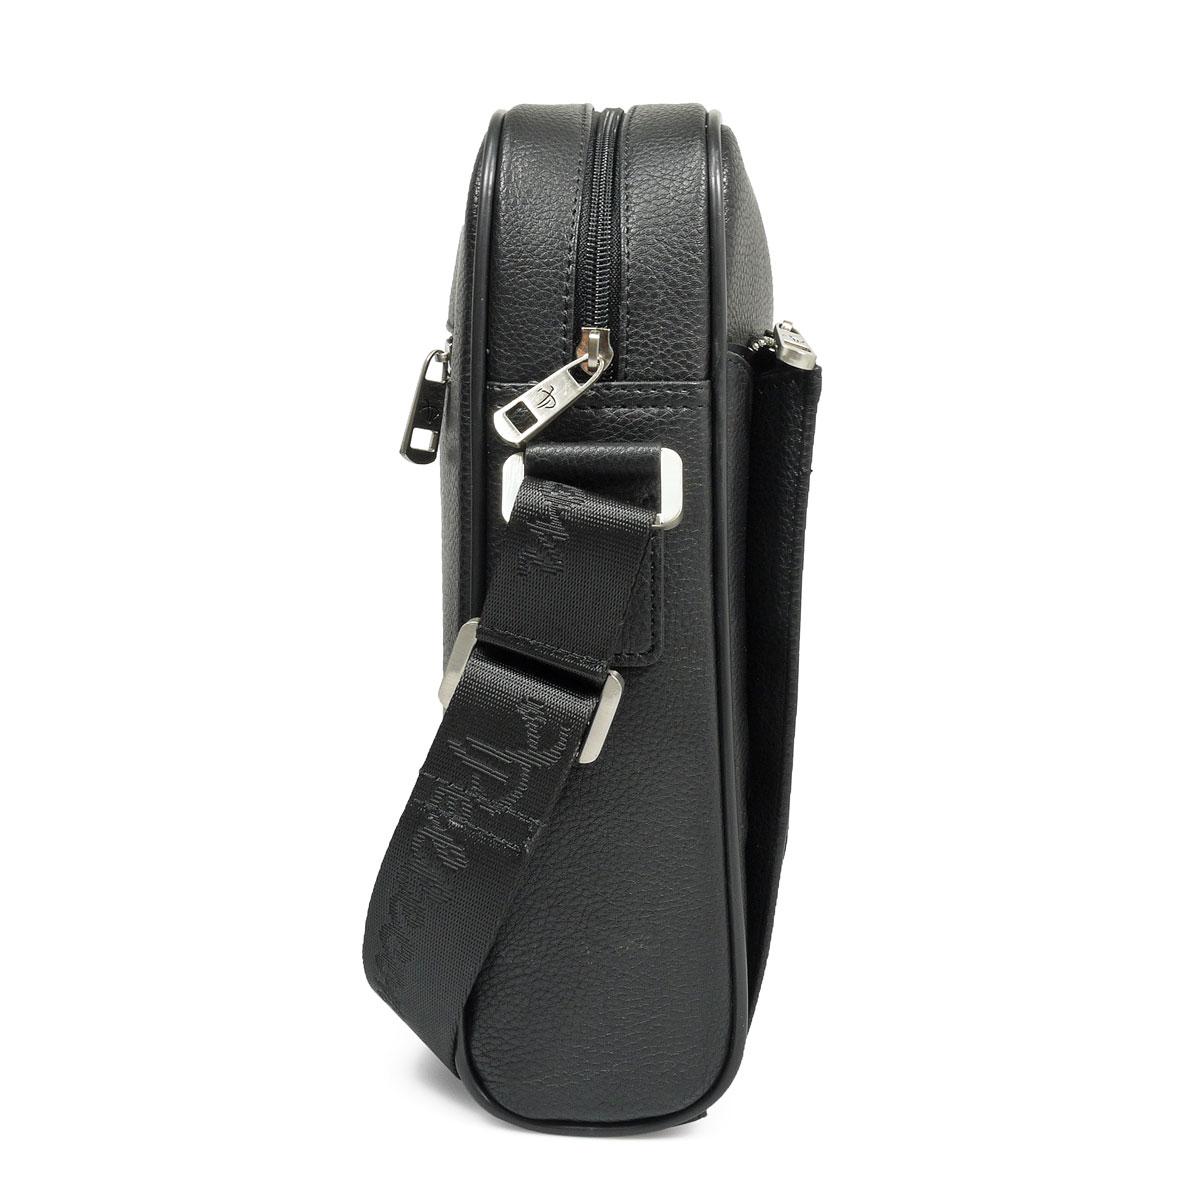 812-21386-1 Men's Bag Pellekon